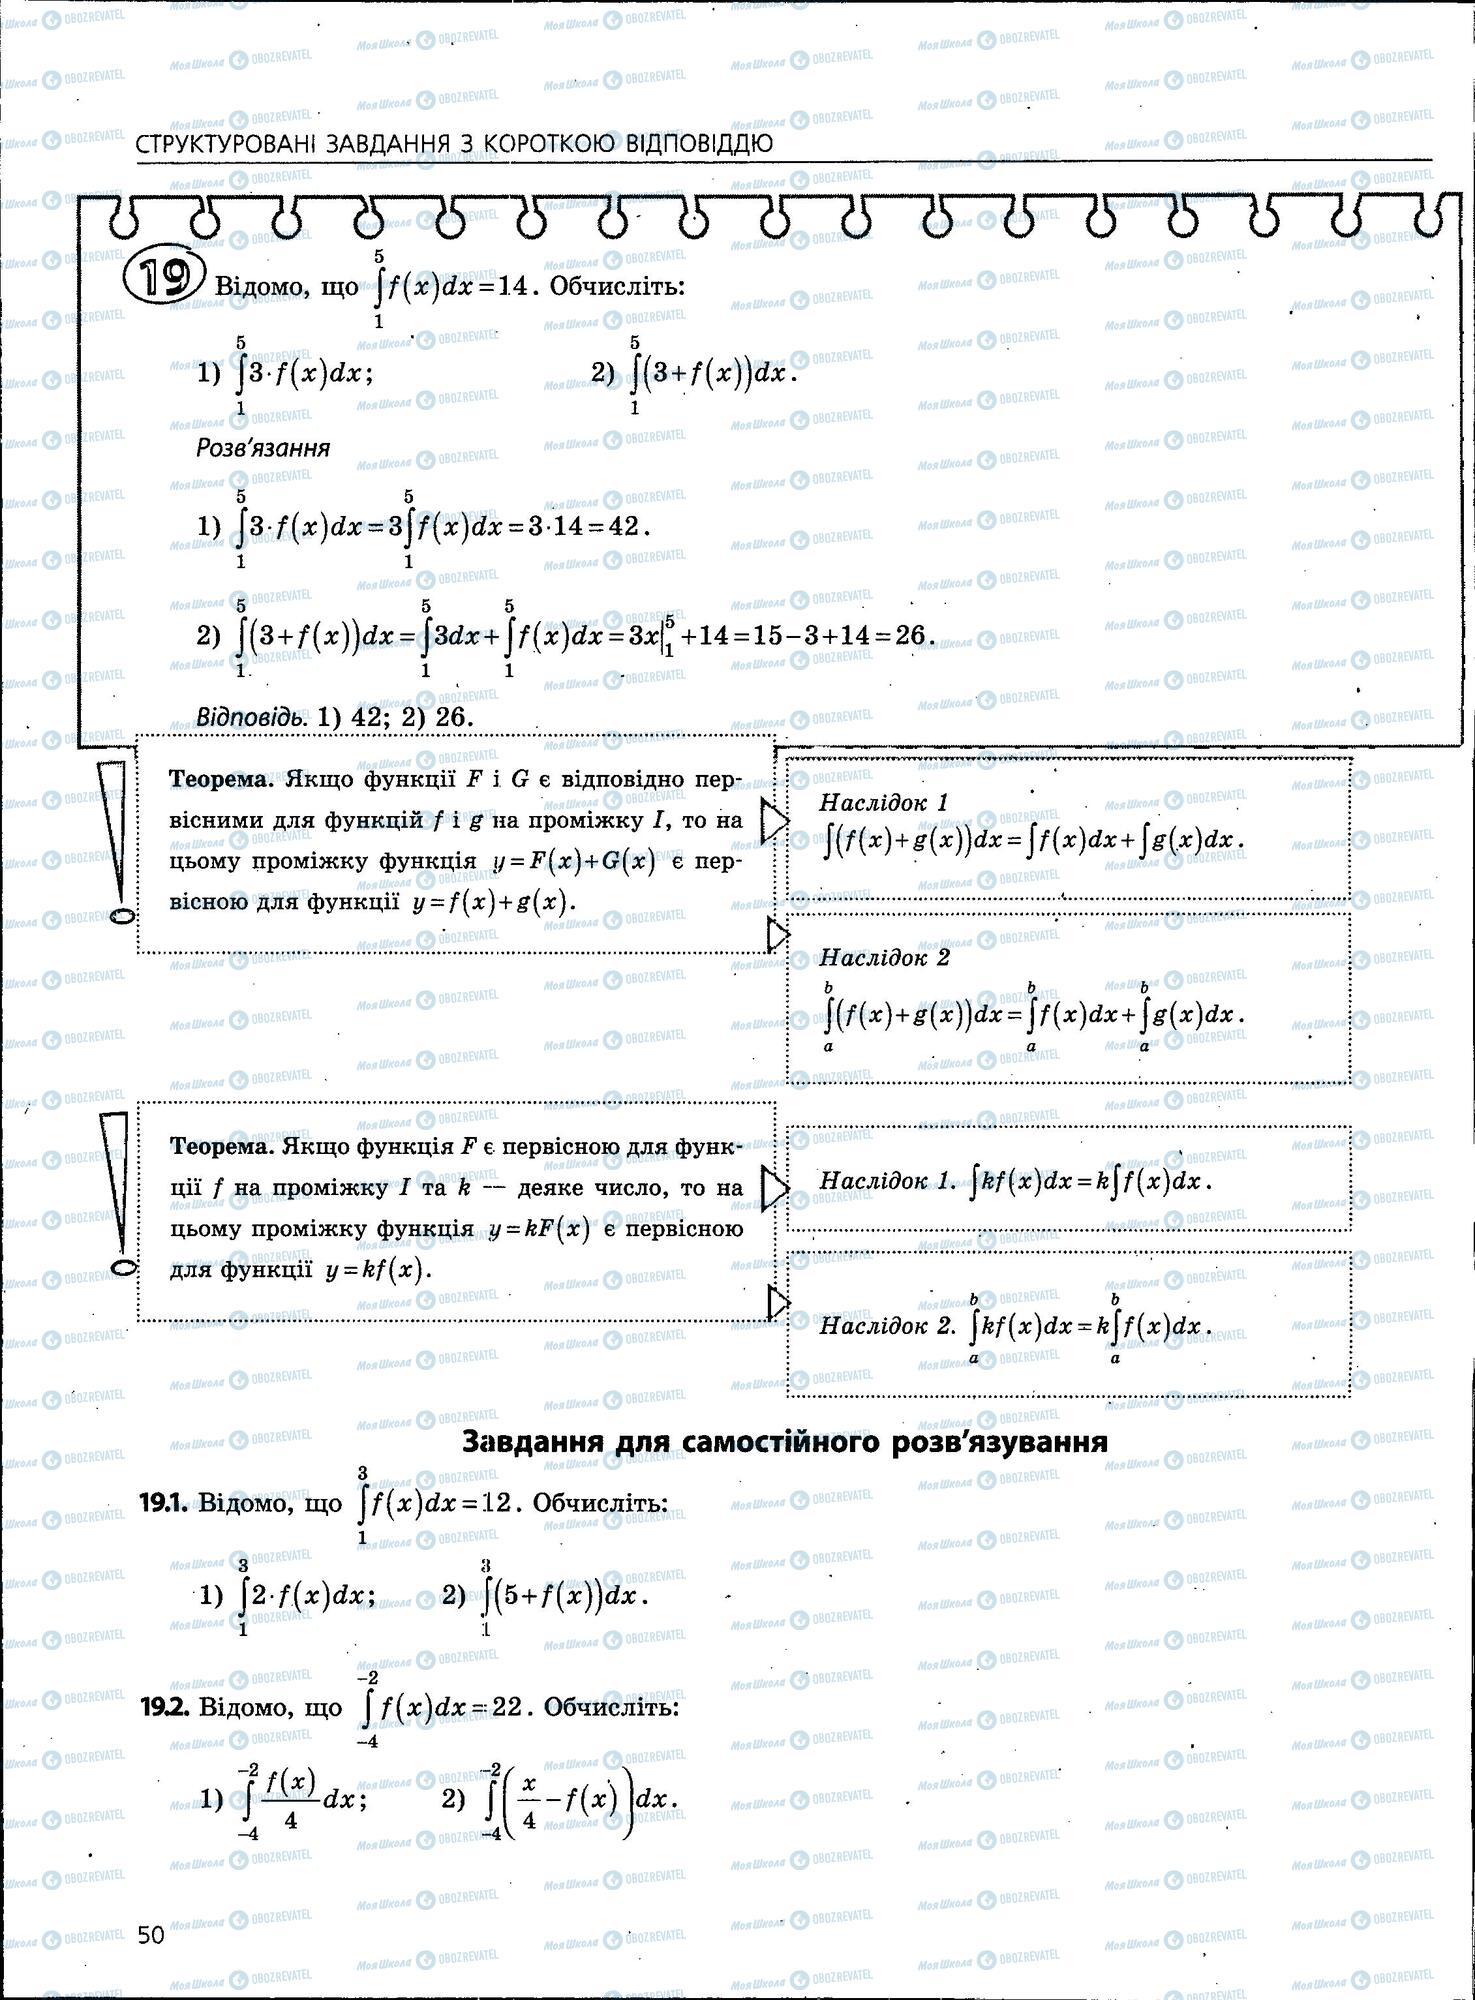 ЗНО Математика 11 класс страница 50